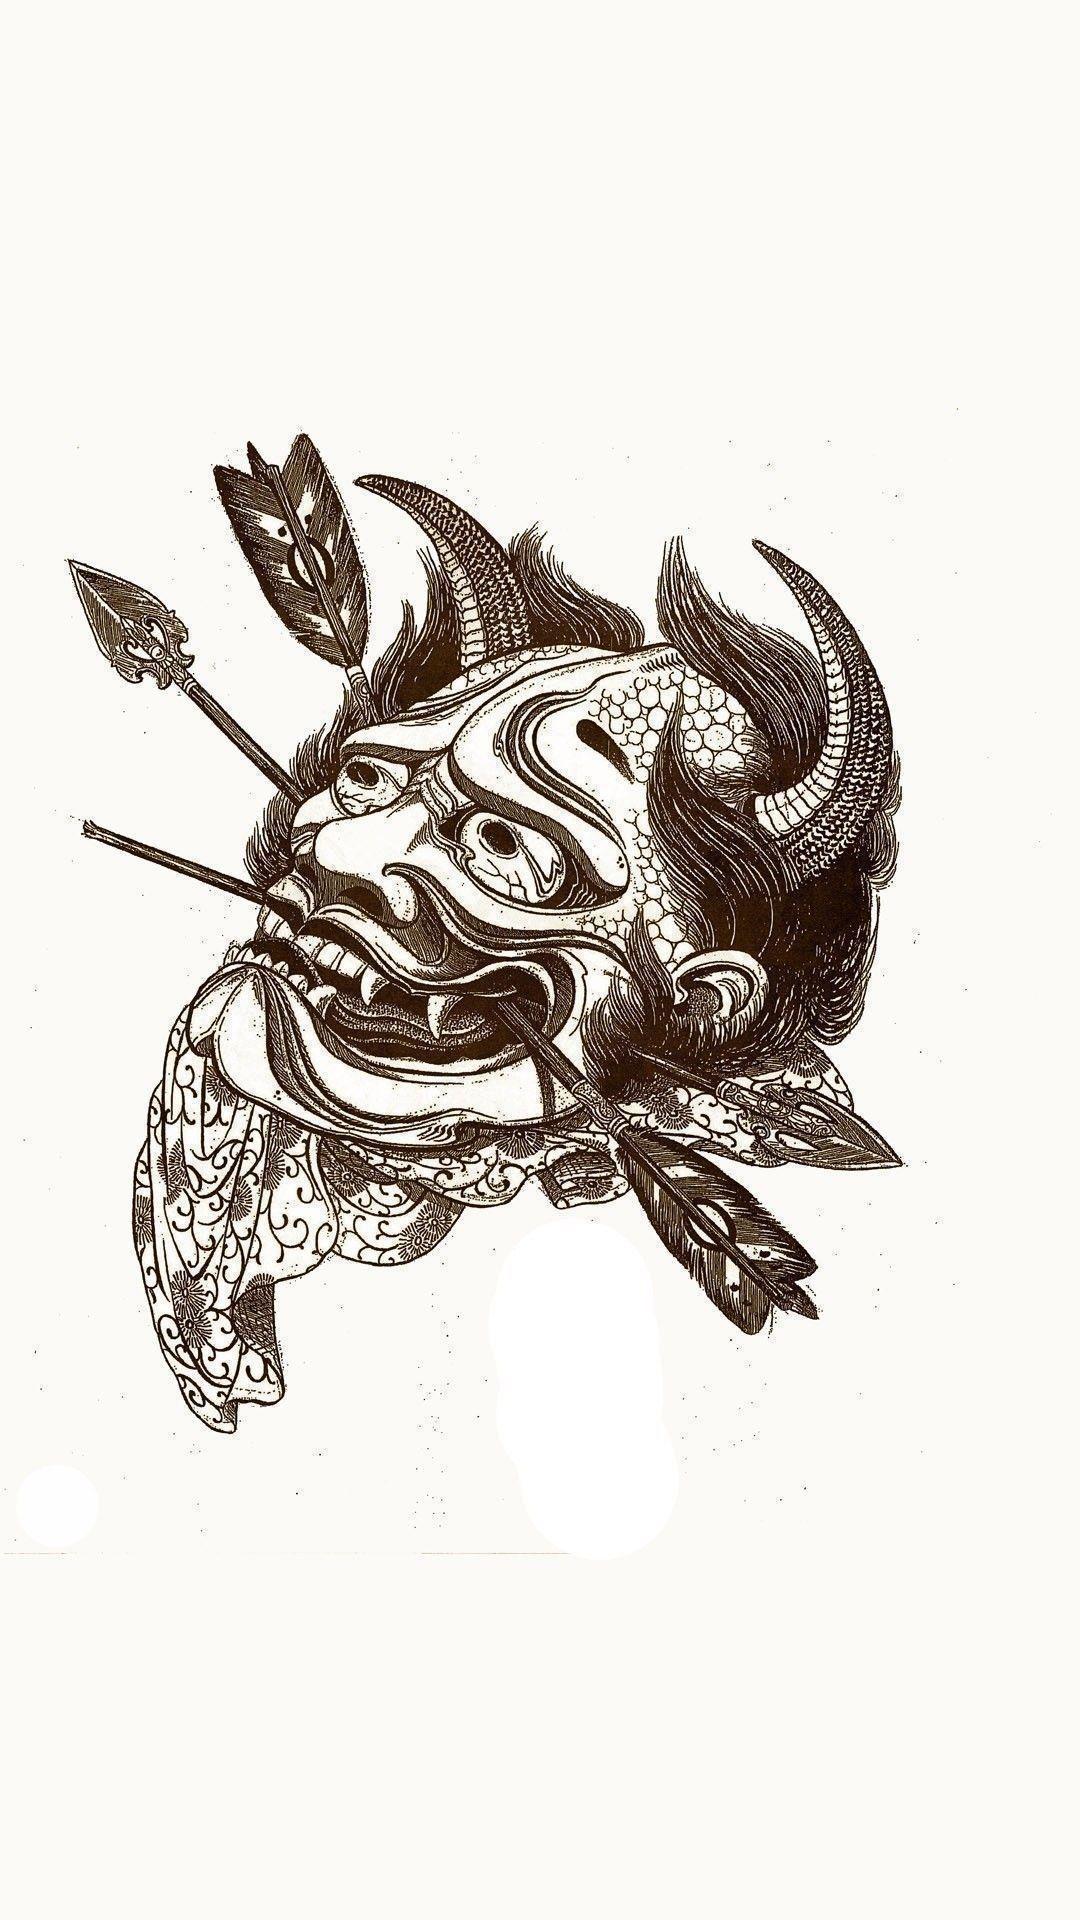 Res: 1080x1920, Japanese tattoo design Mobile Wallpaper 5639